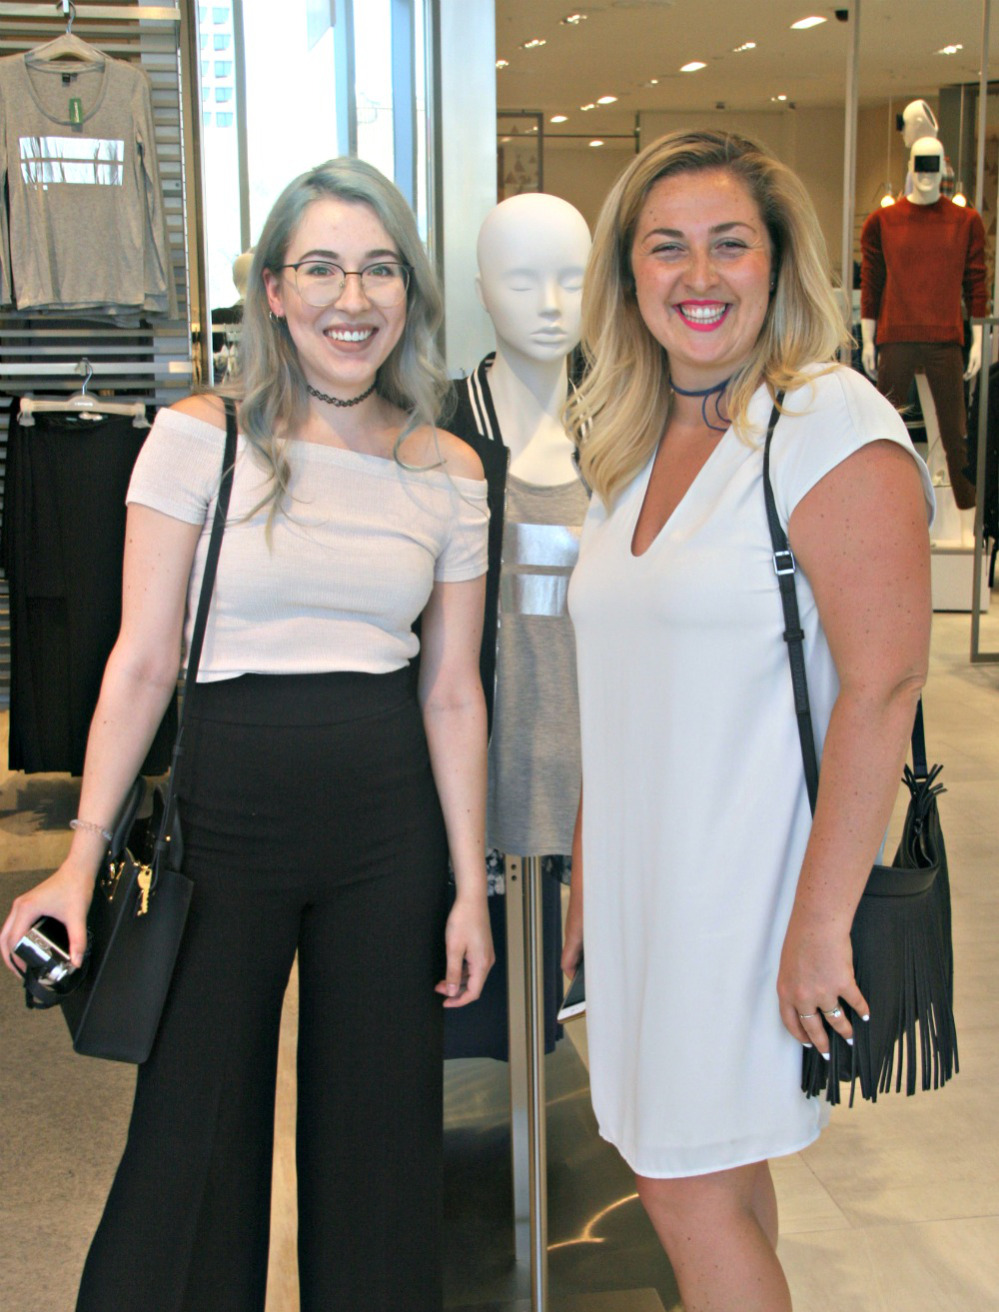 Chloe xochloegordon and Chantal Chantsy at Simons Ottawa